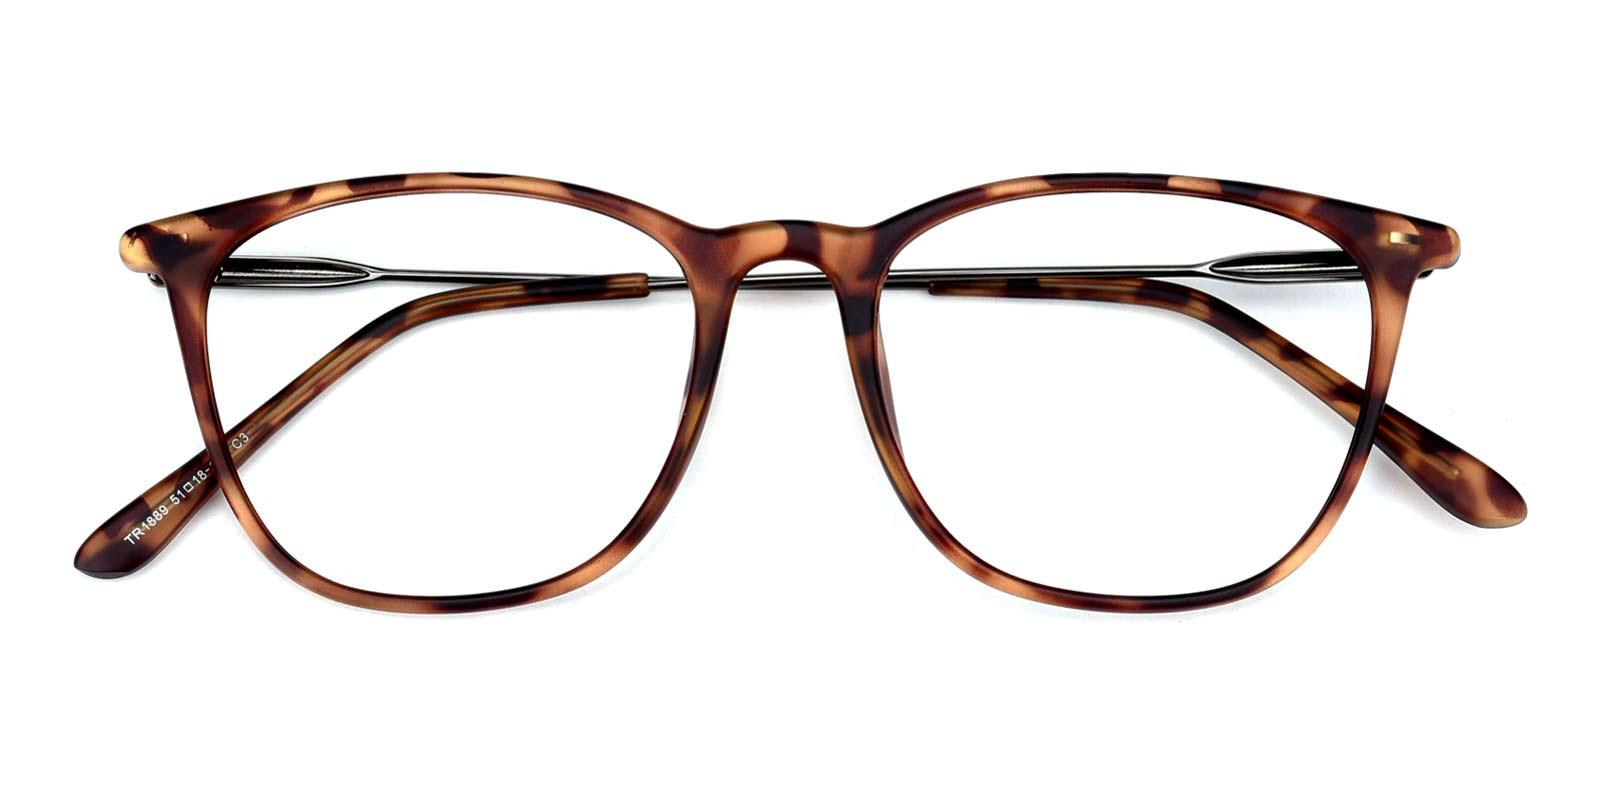 Who-Tortoise-Square-TR-Eyeglasses-detail